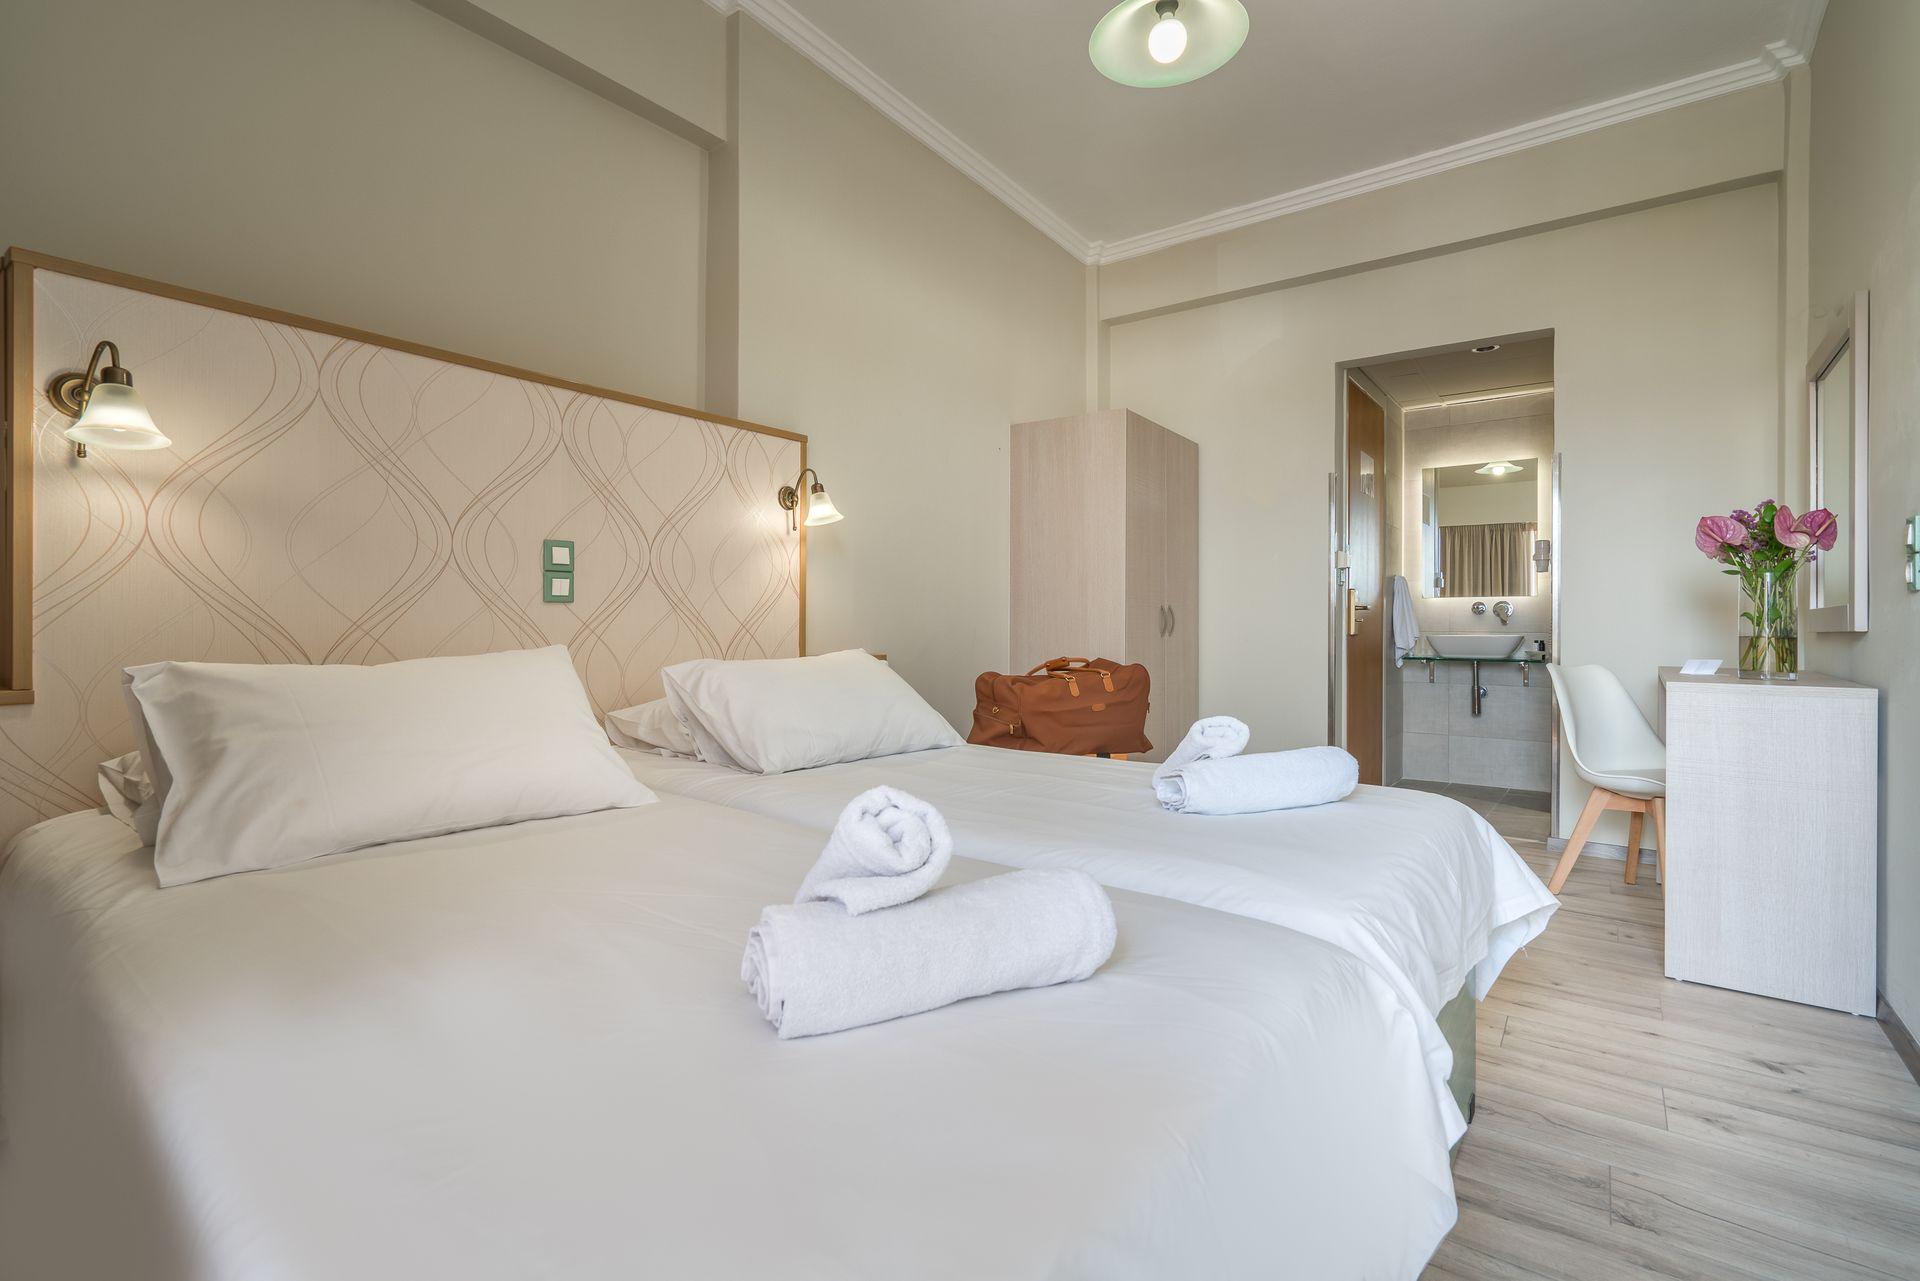 Phoenix Hotel Zante - Ζάκυνθος ✦ -32% ✦ 4 Ημέρες (3